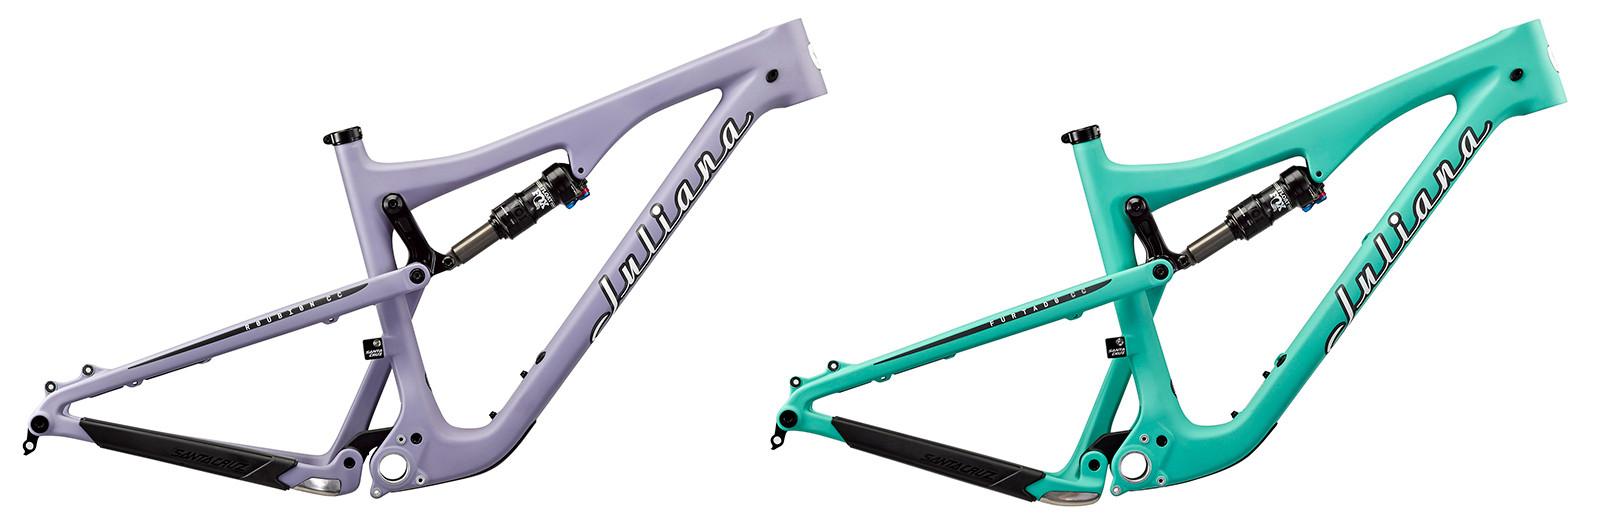 First Look, First Ride: 2016 Juliana Roubion II and Furtado II ...